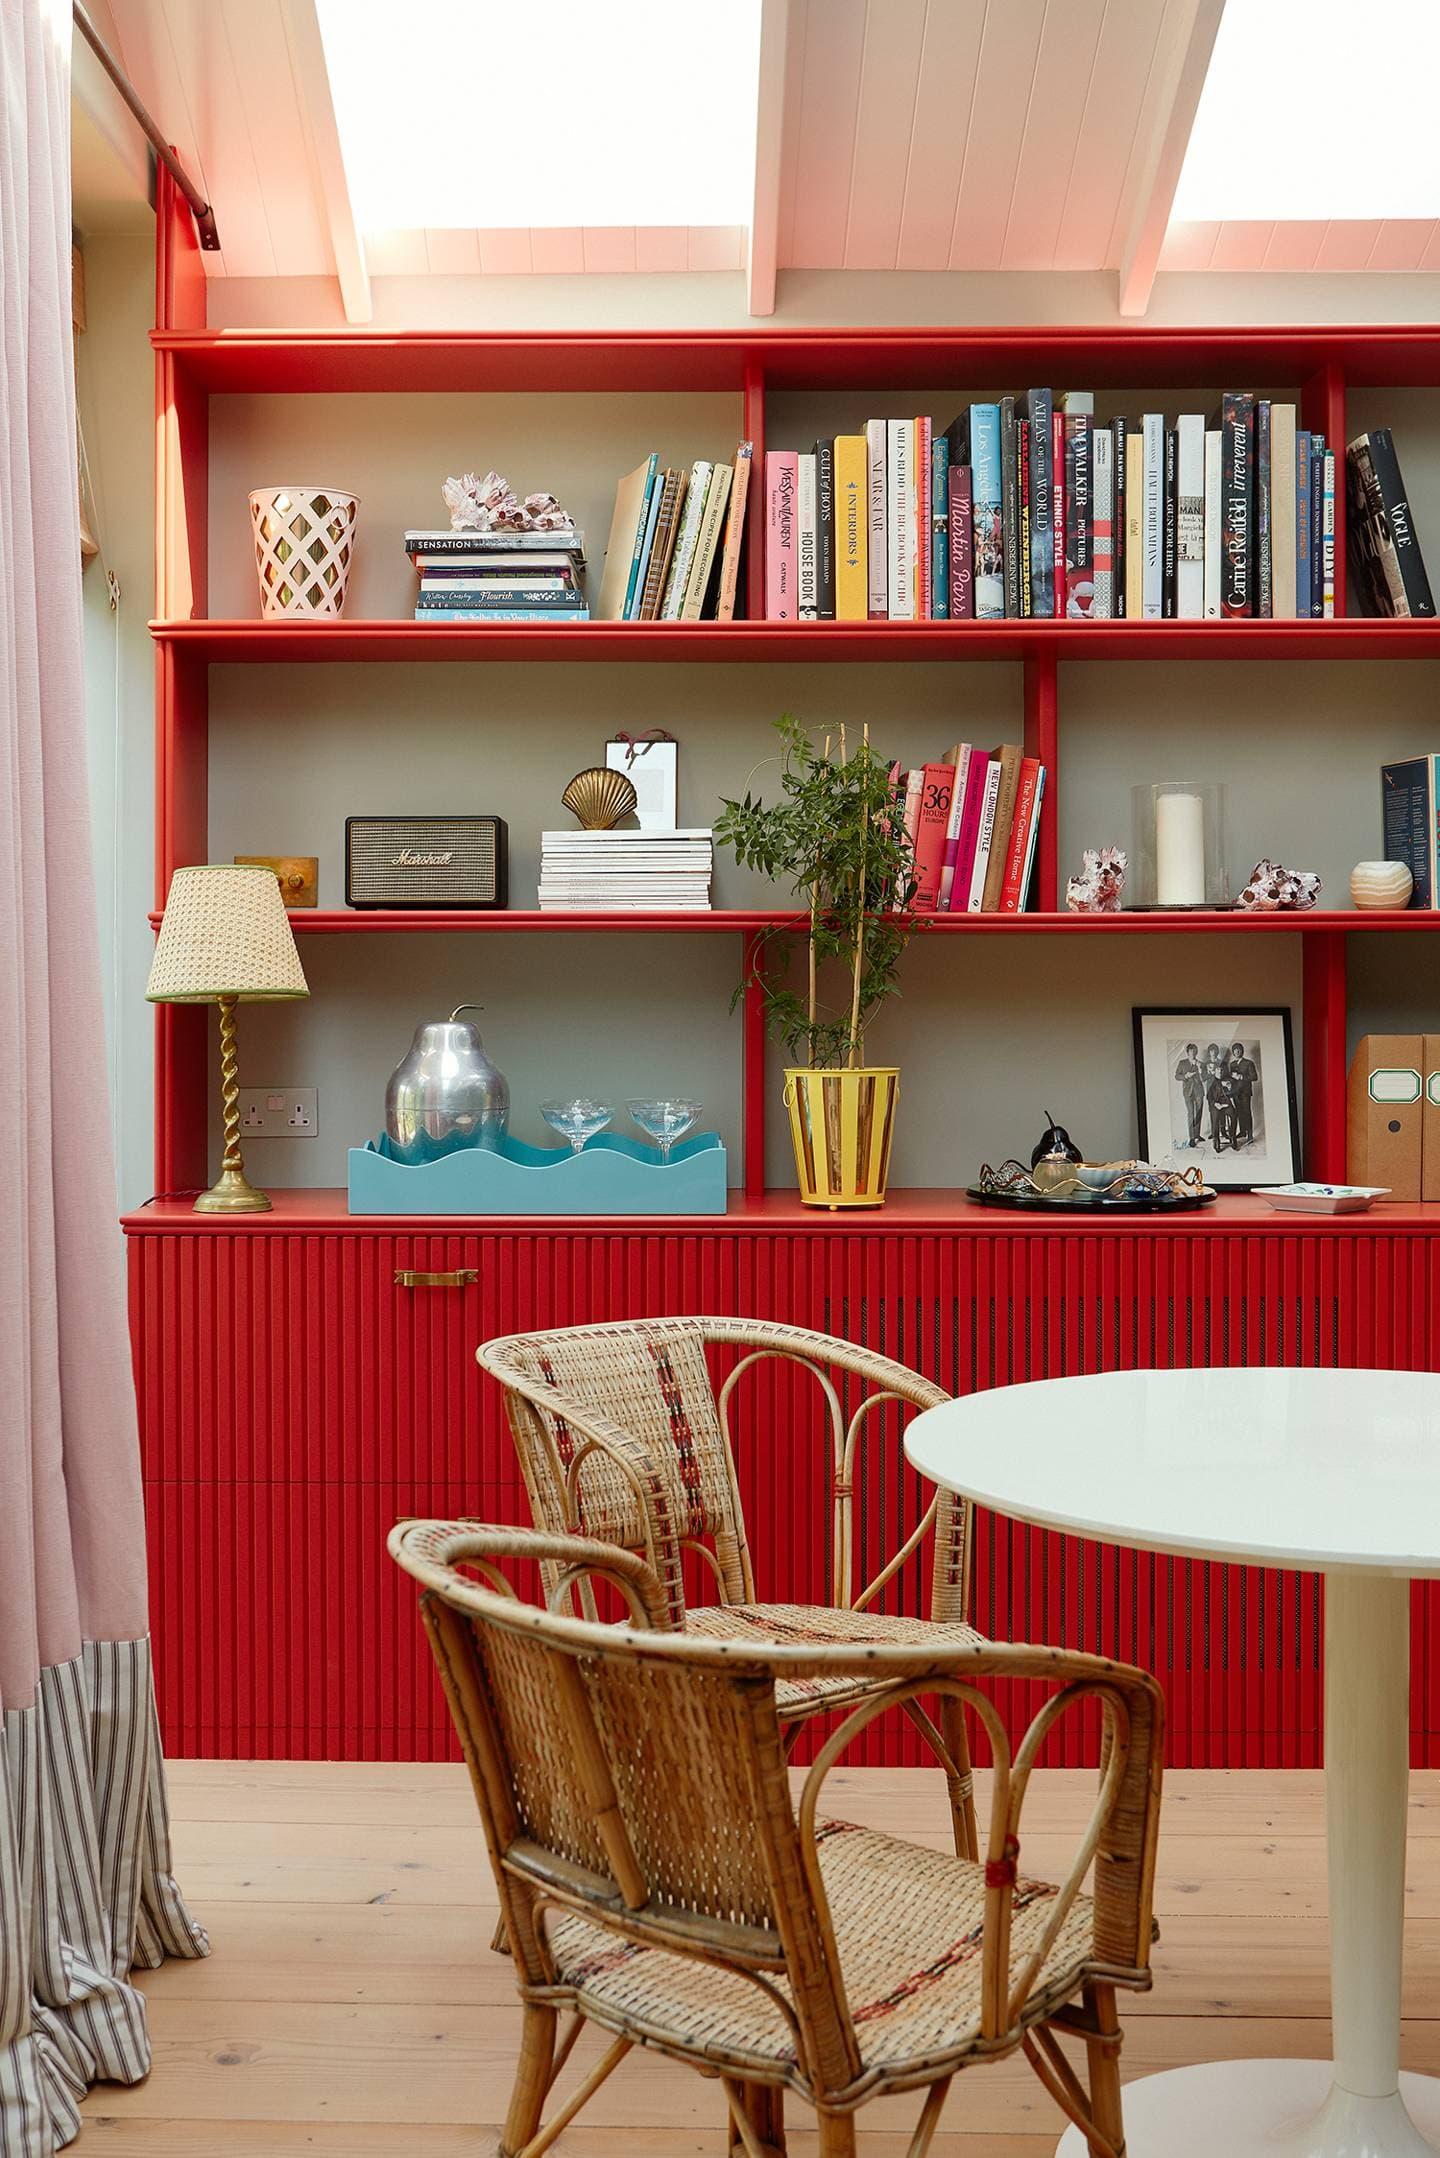 this is matilda goads home renovation, a leading british interior designer